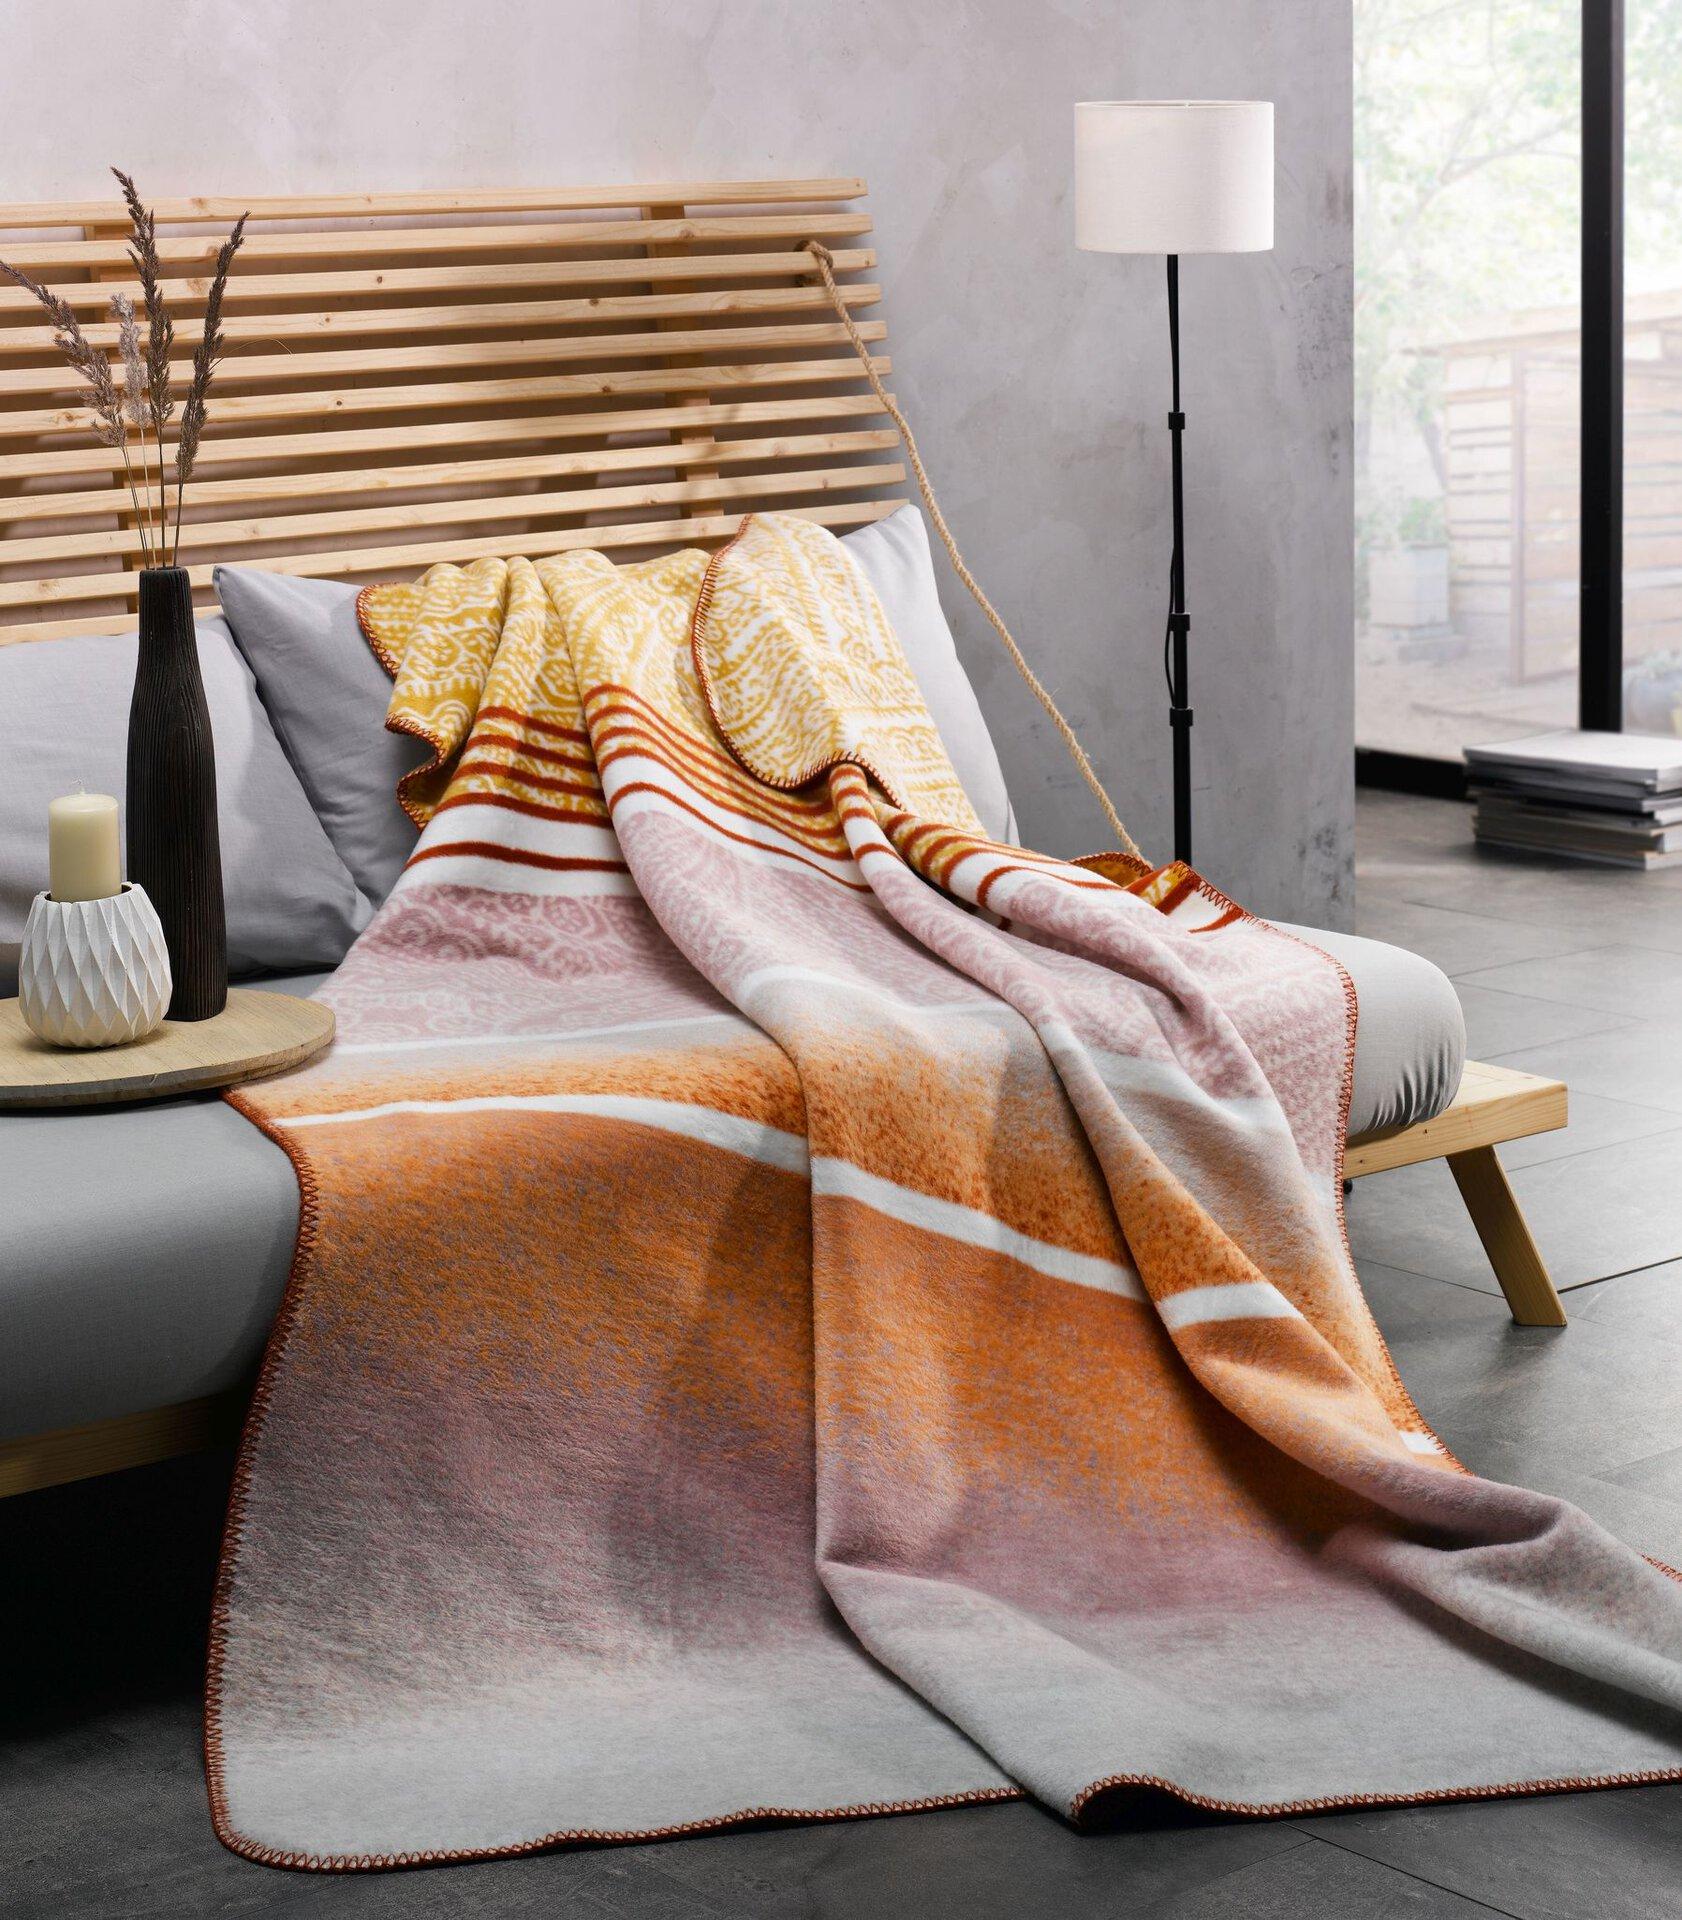 Wohndecke Emil Casa Nova Textil mehrfarbig 130 x 170 cm